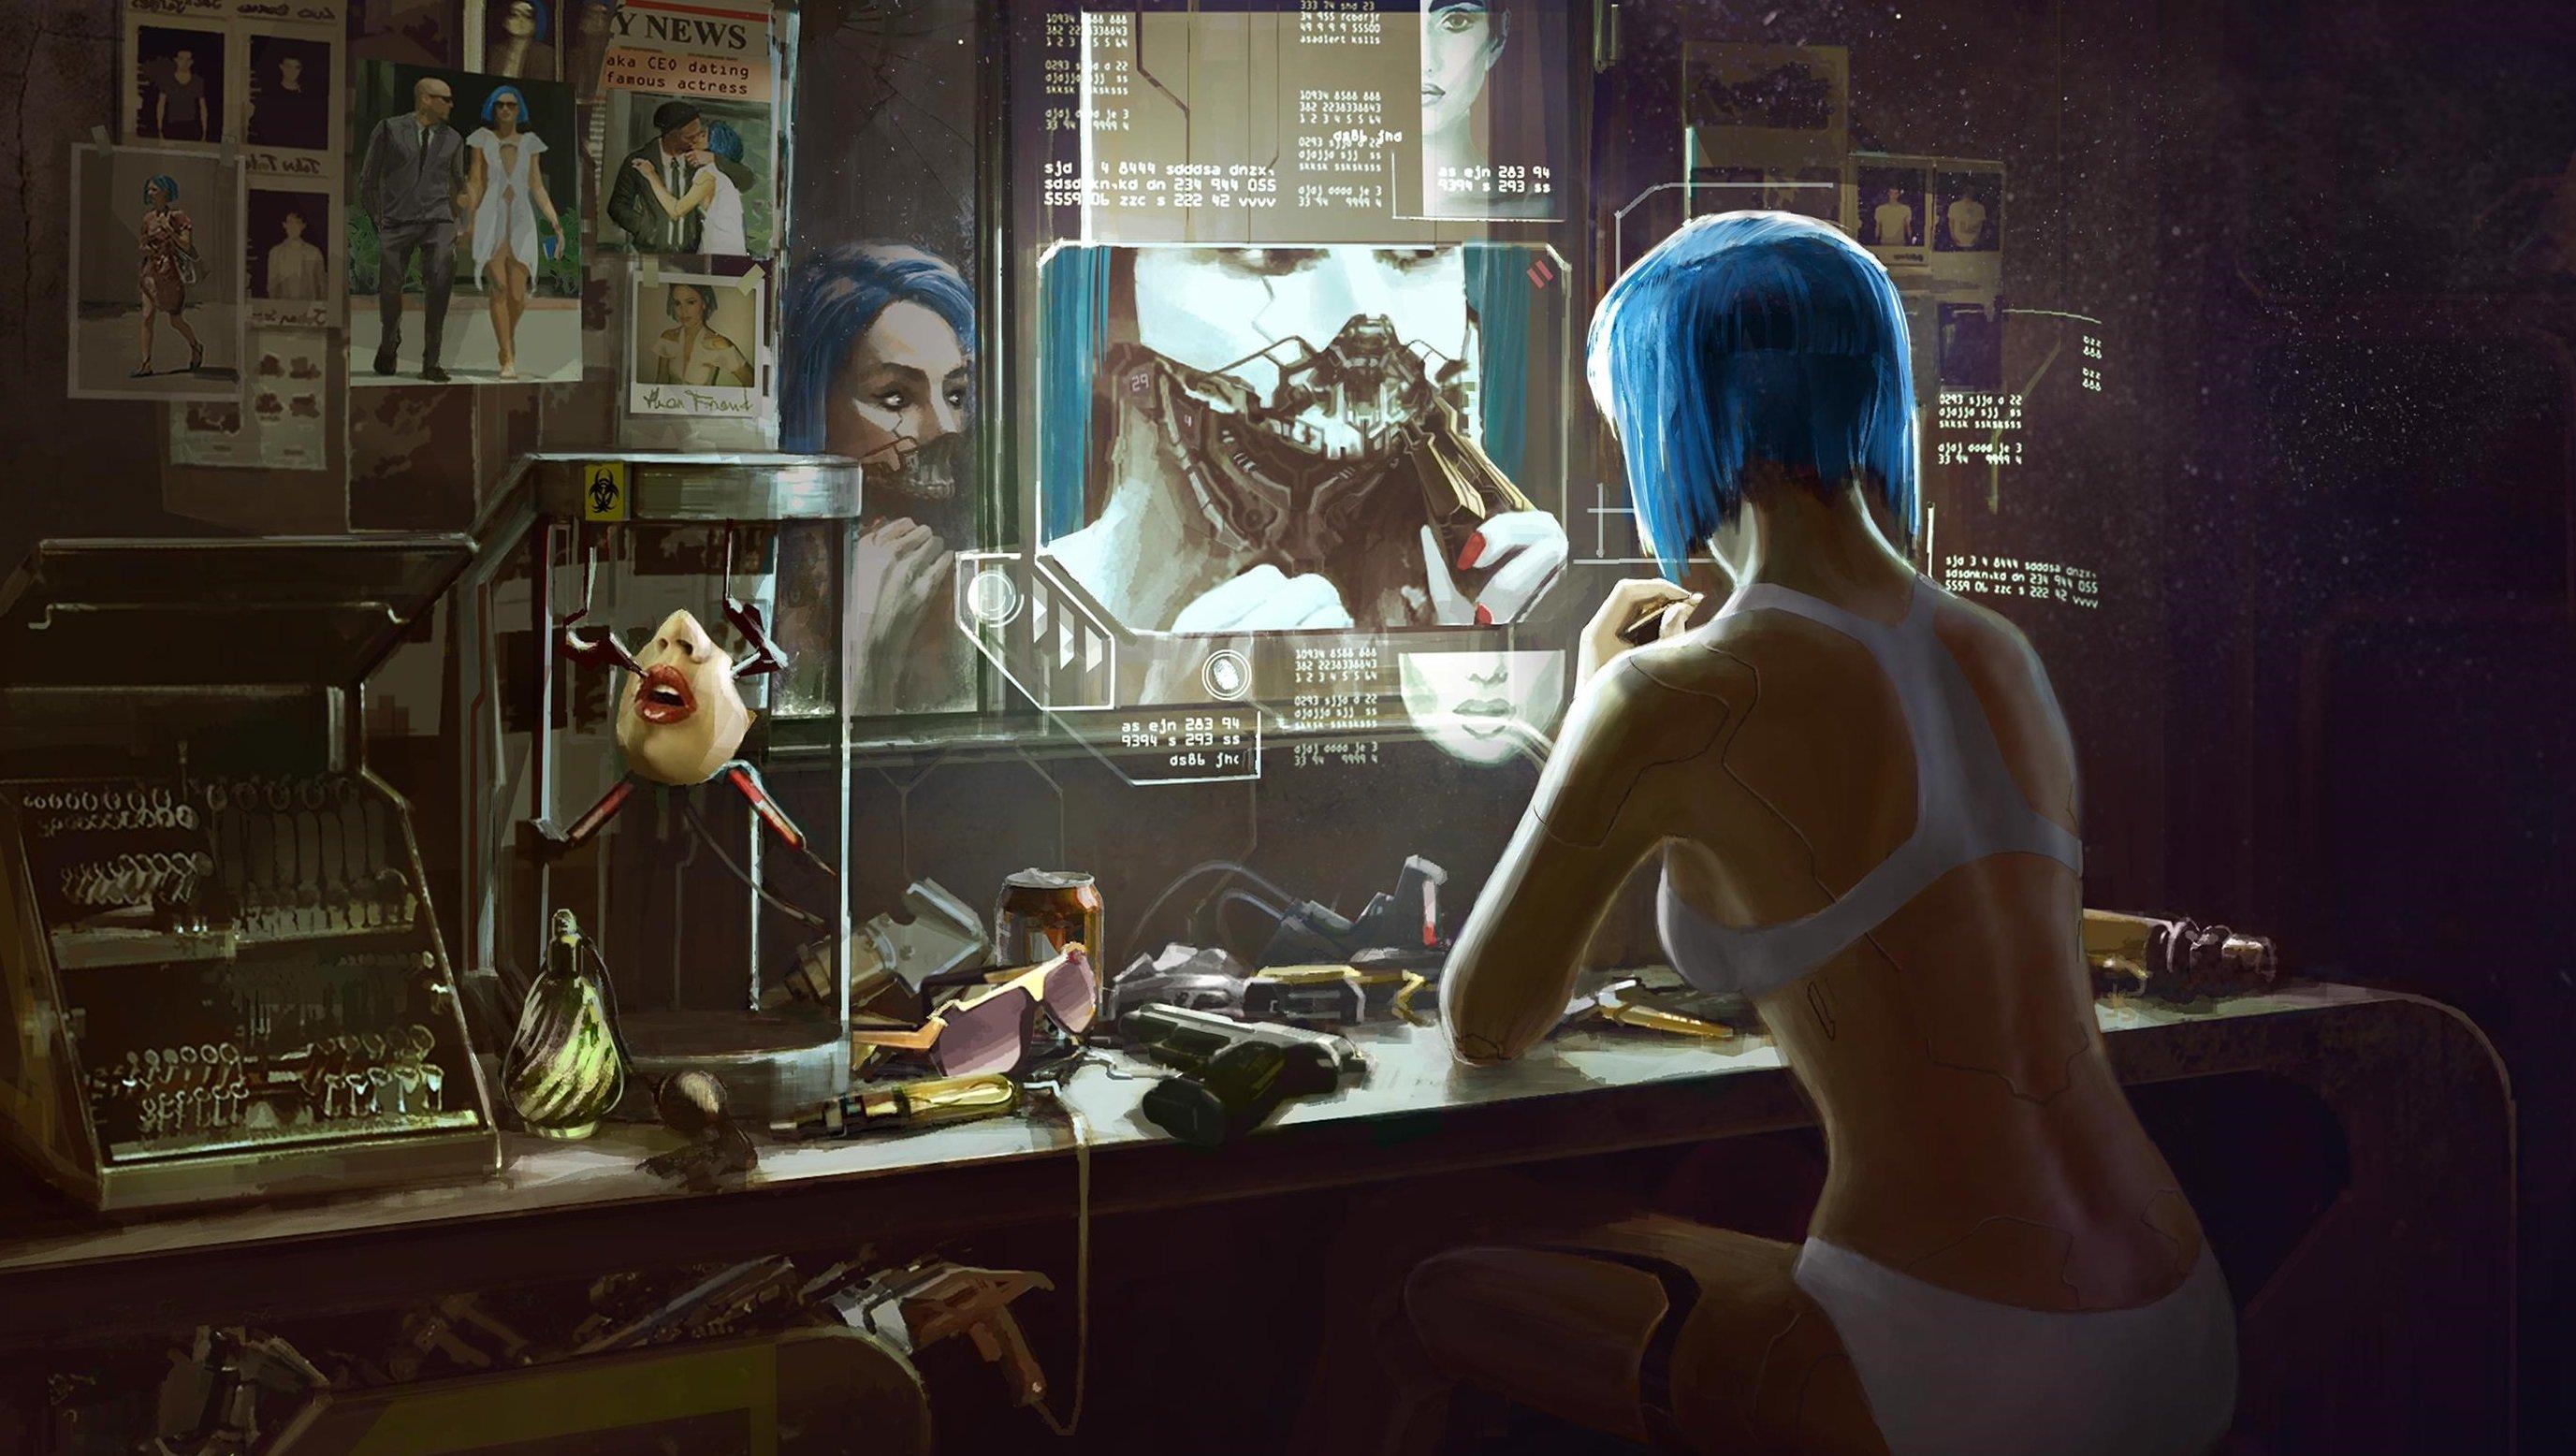 E3 2019 aura un nouveau Cyberpunk 2077 info 2077